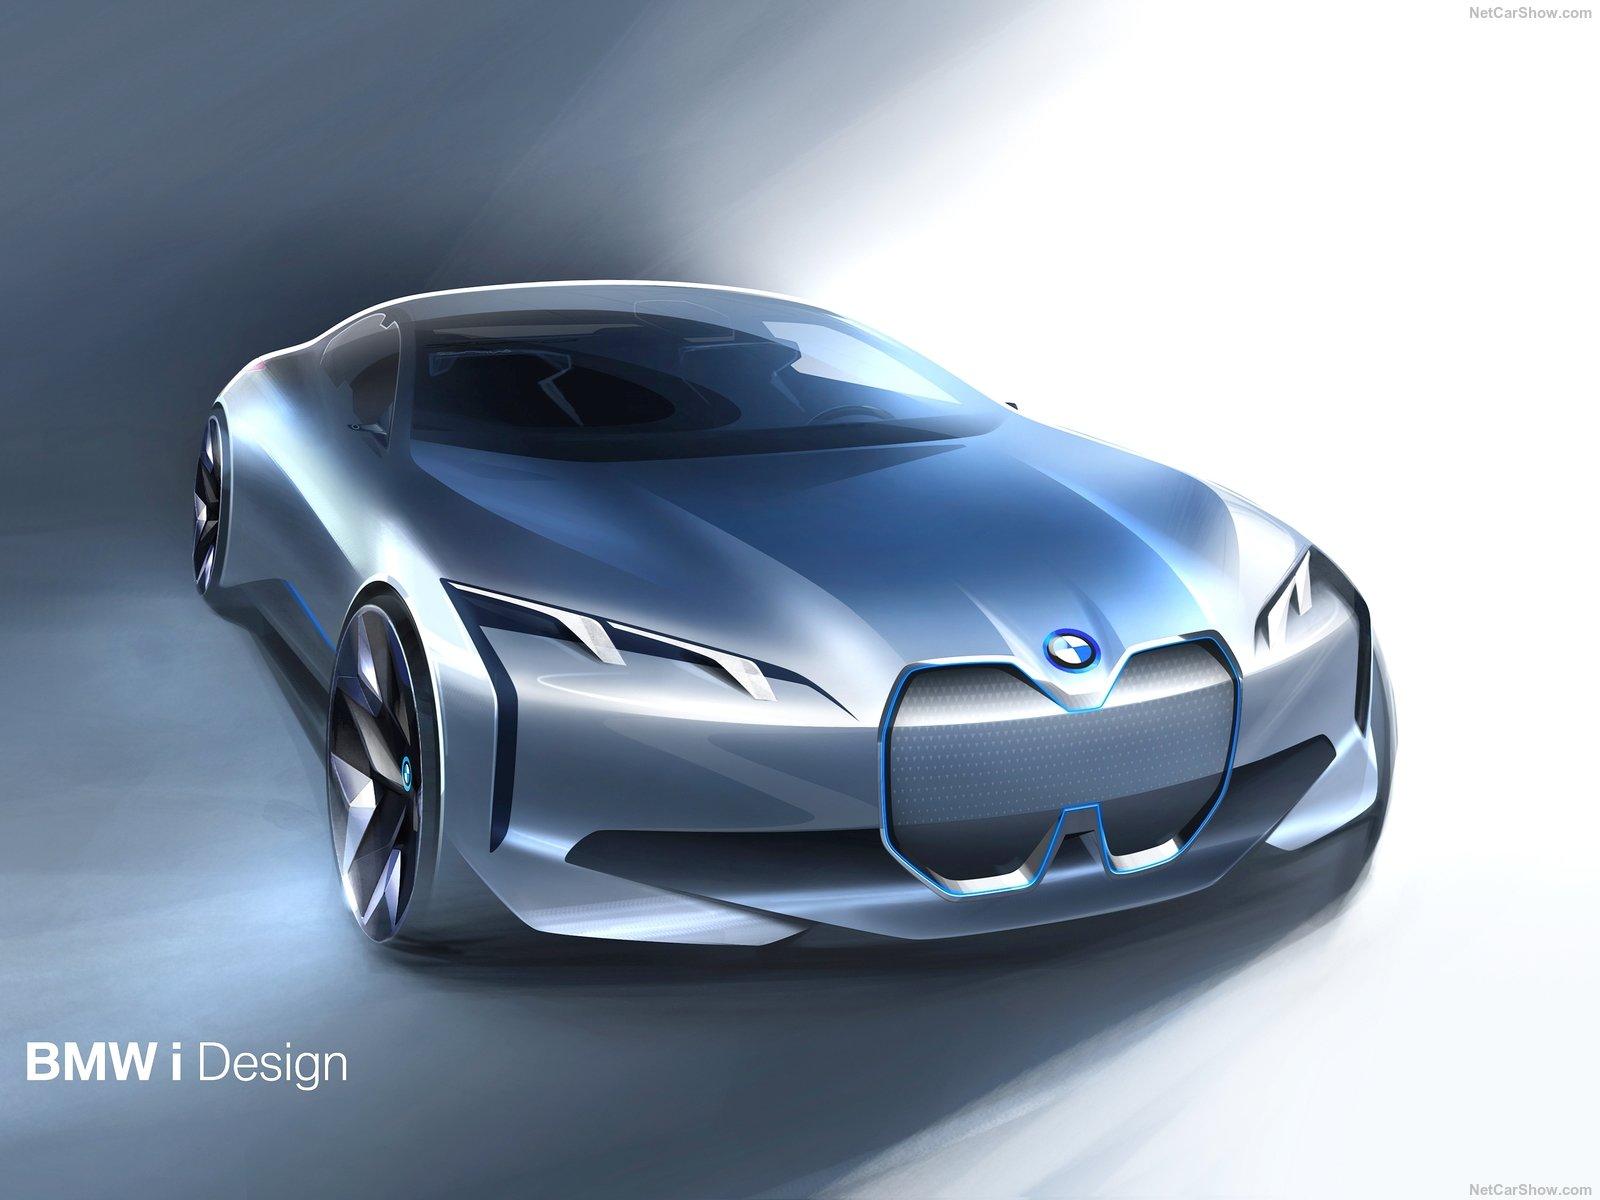 BMW i Vision Dynamics unveiled at Frankfurt IAA